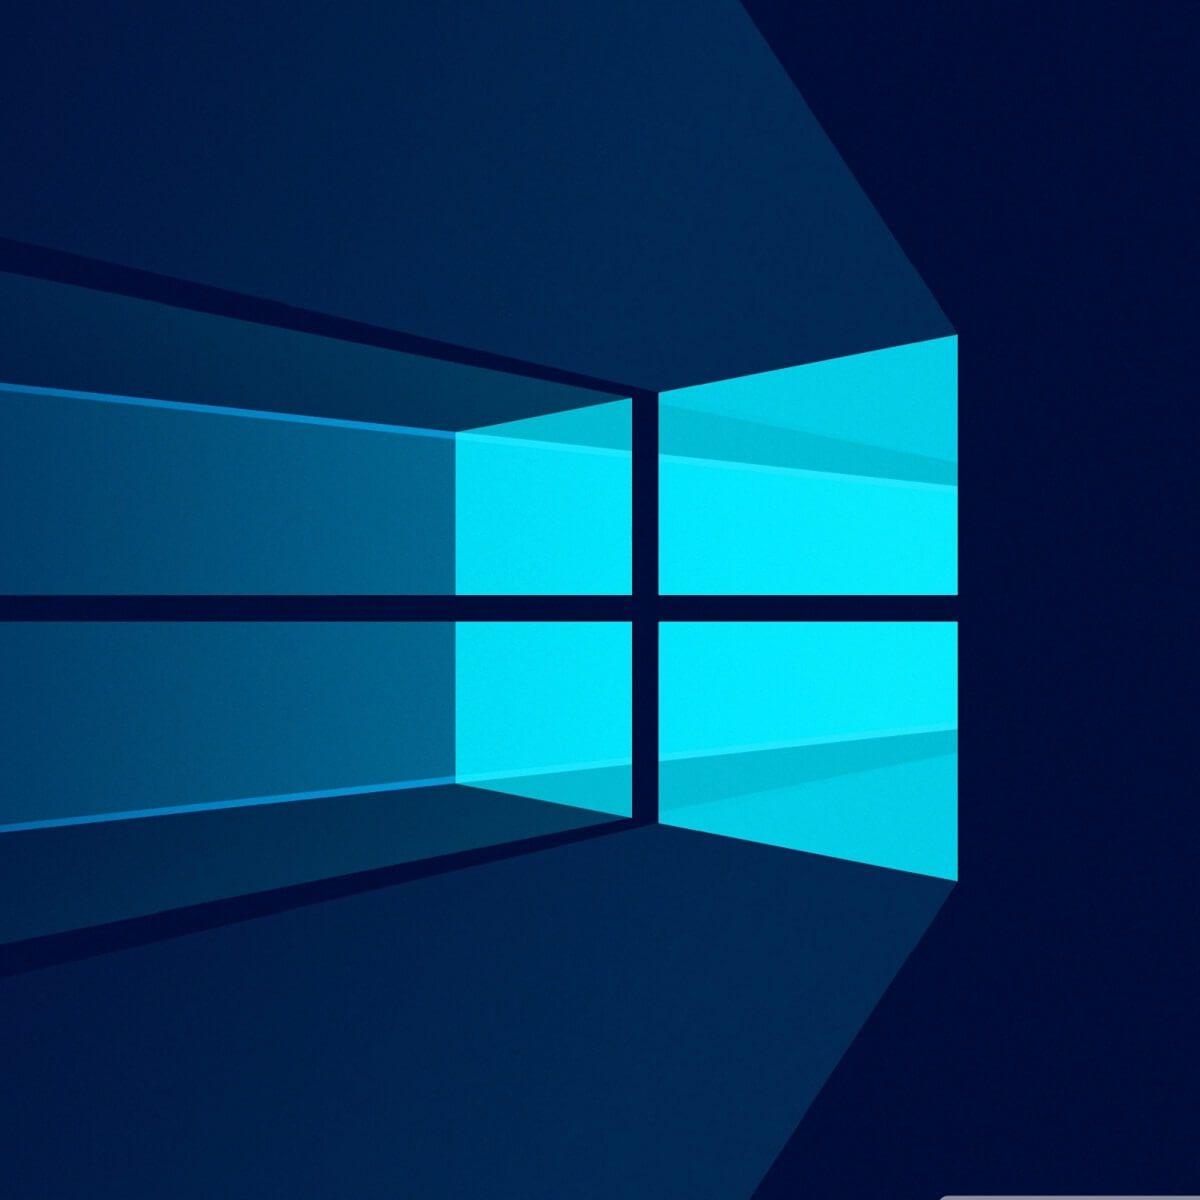 Windows 7 Vs Windows 10 Sound Quality In 2020 Microsoft Wallpaper Windows Wallpaper Windows